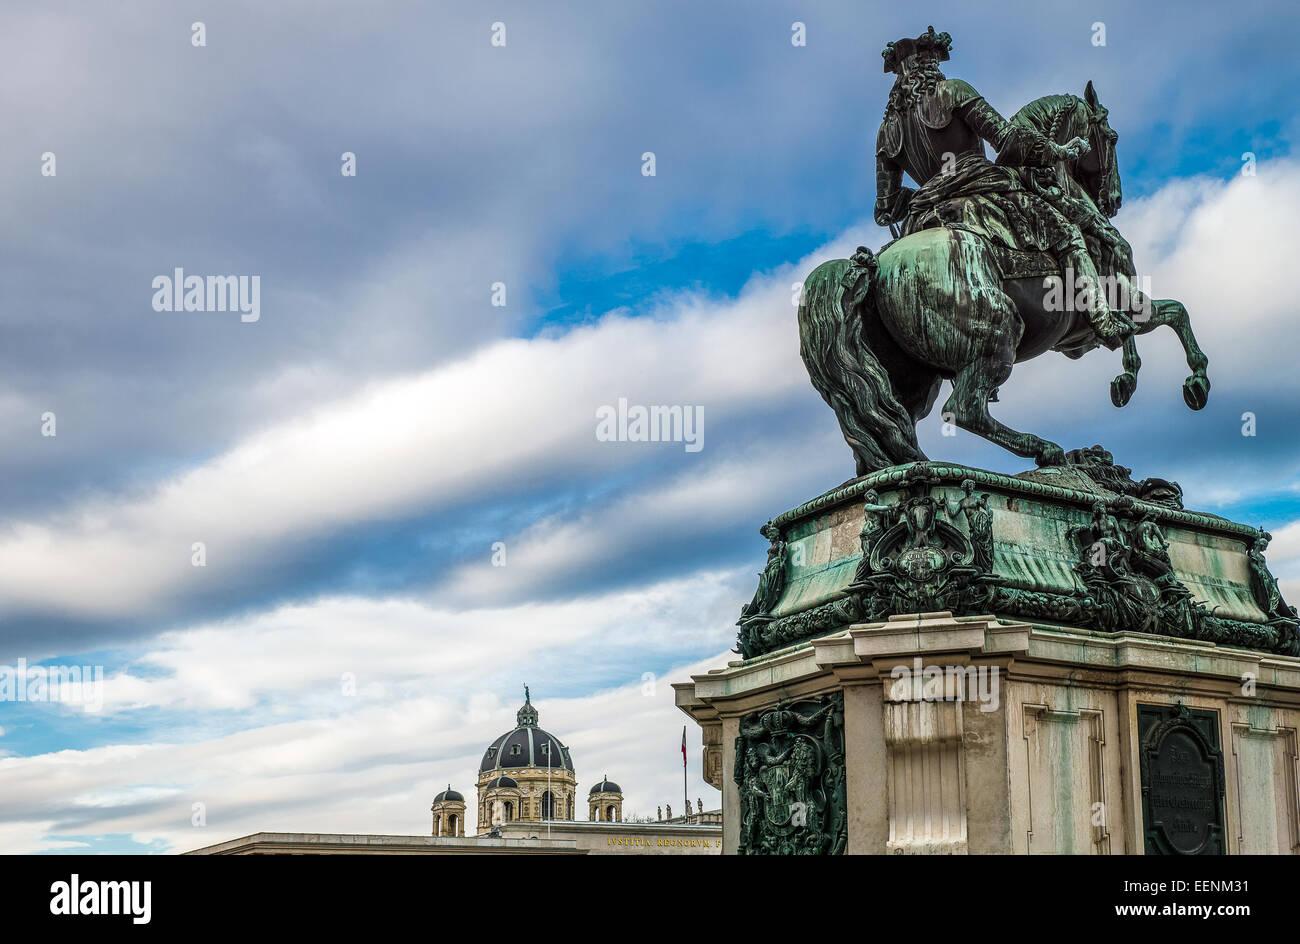 Austria, Vienna, Heldenplatz, the equestrian monument of the Prince Eugene - Stock Image